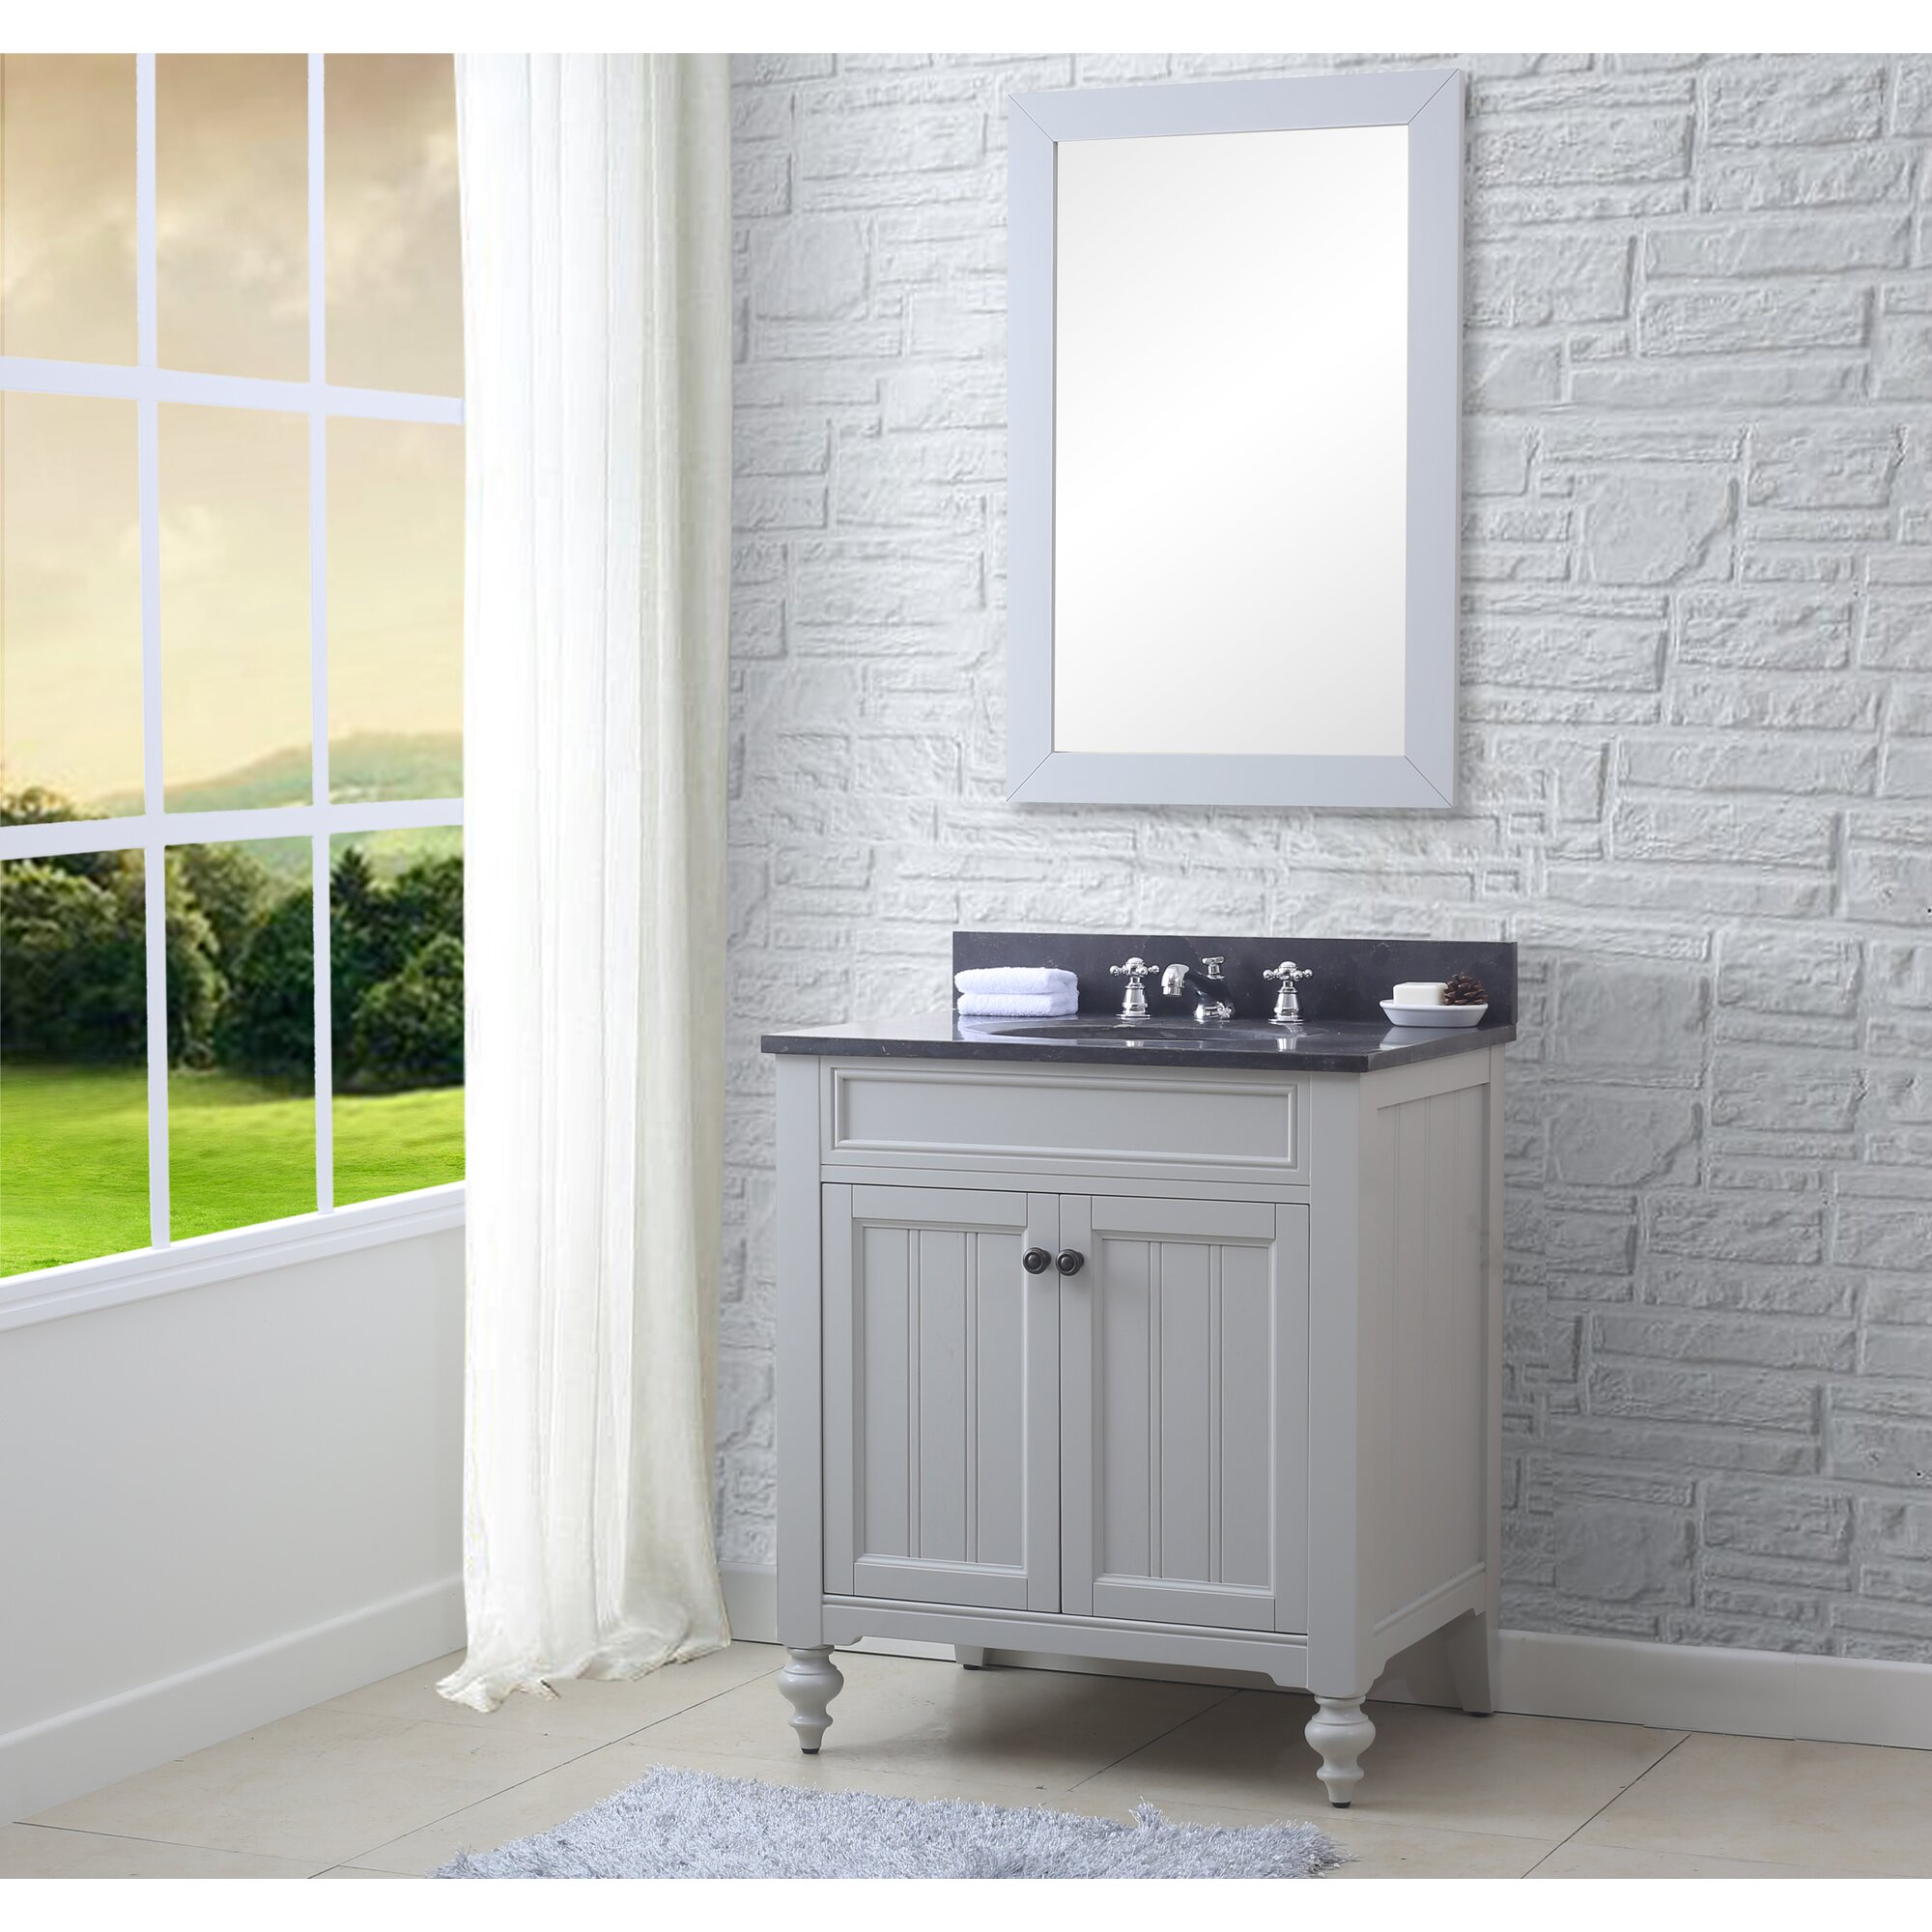 "30 In Bathroom Vanity latimer 30"" single bathroom vanity set with mirror and faucet"